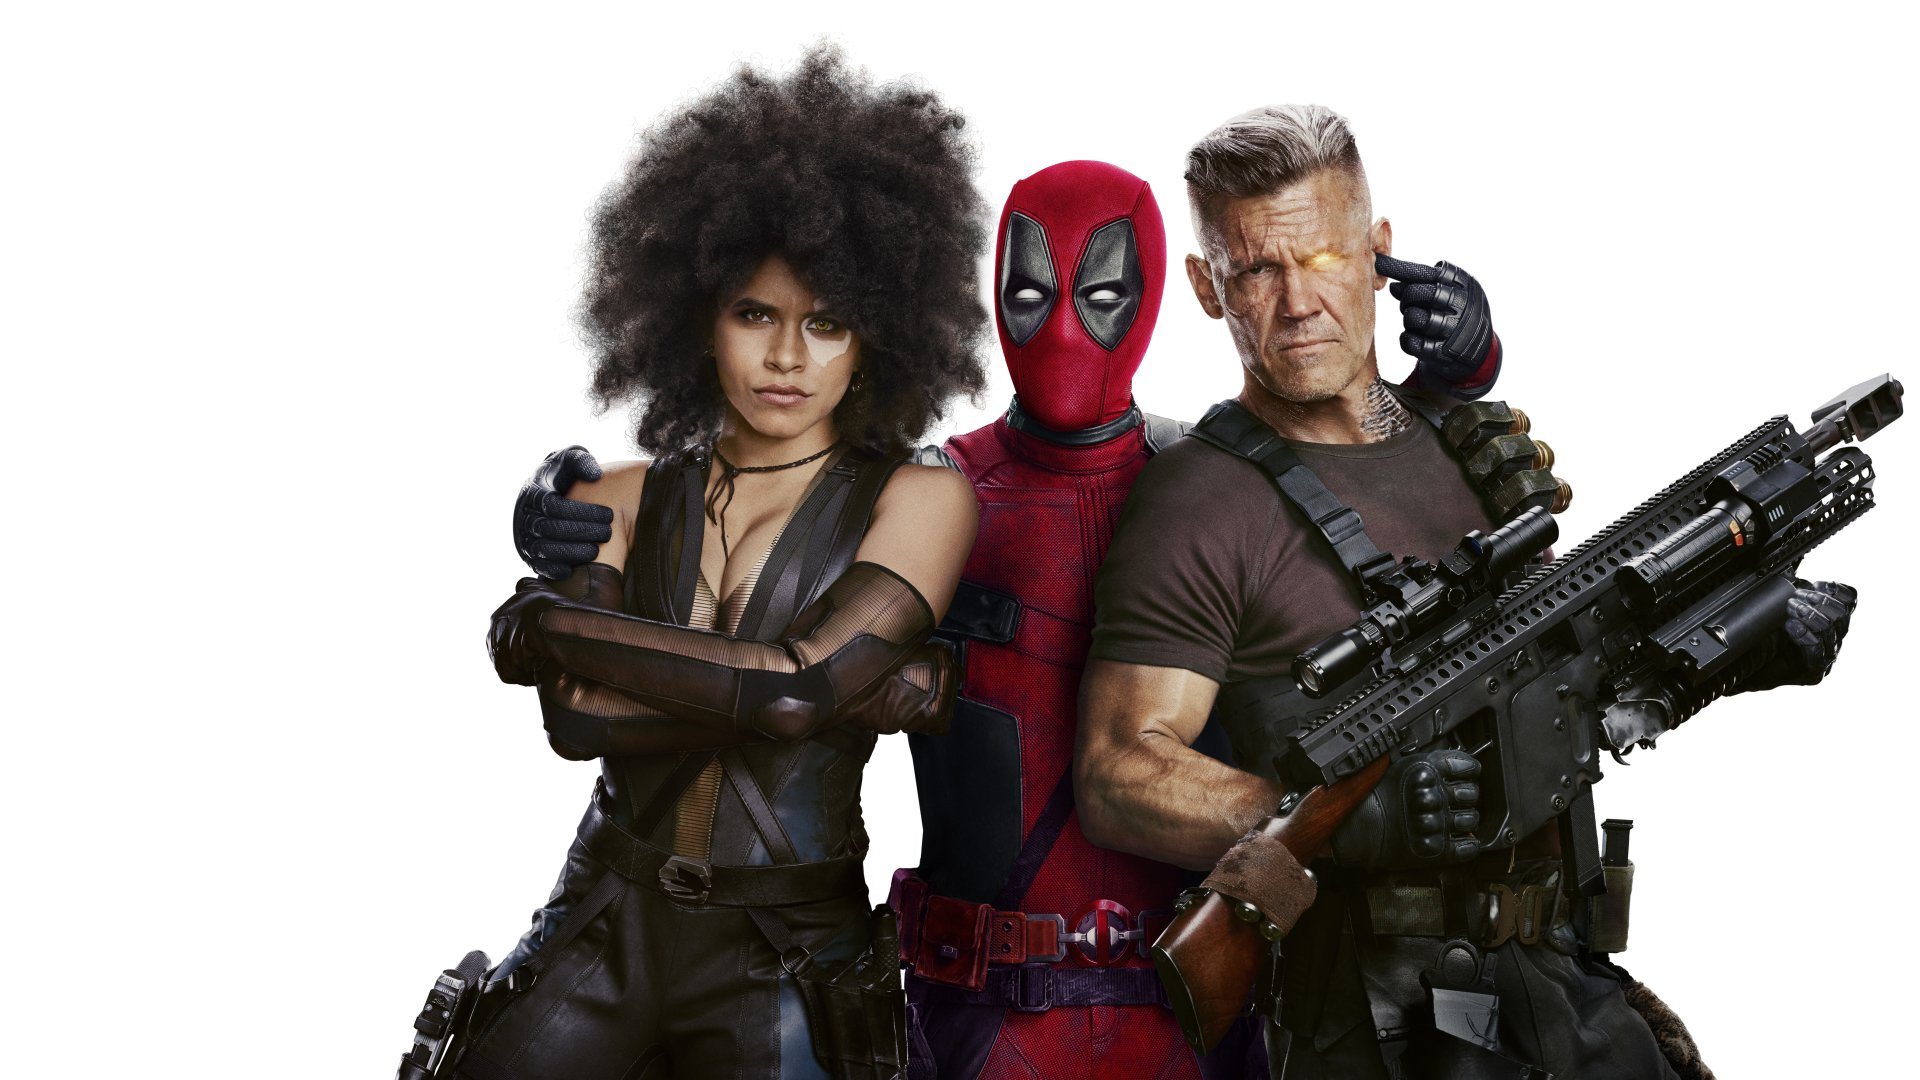 Marvel Deadpool Ausmalbilder Gratis: DeadPool 2, Fondos De Pantalla De Deadpool 2, Wallpapers